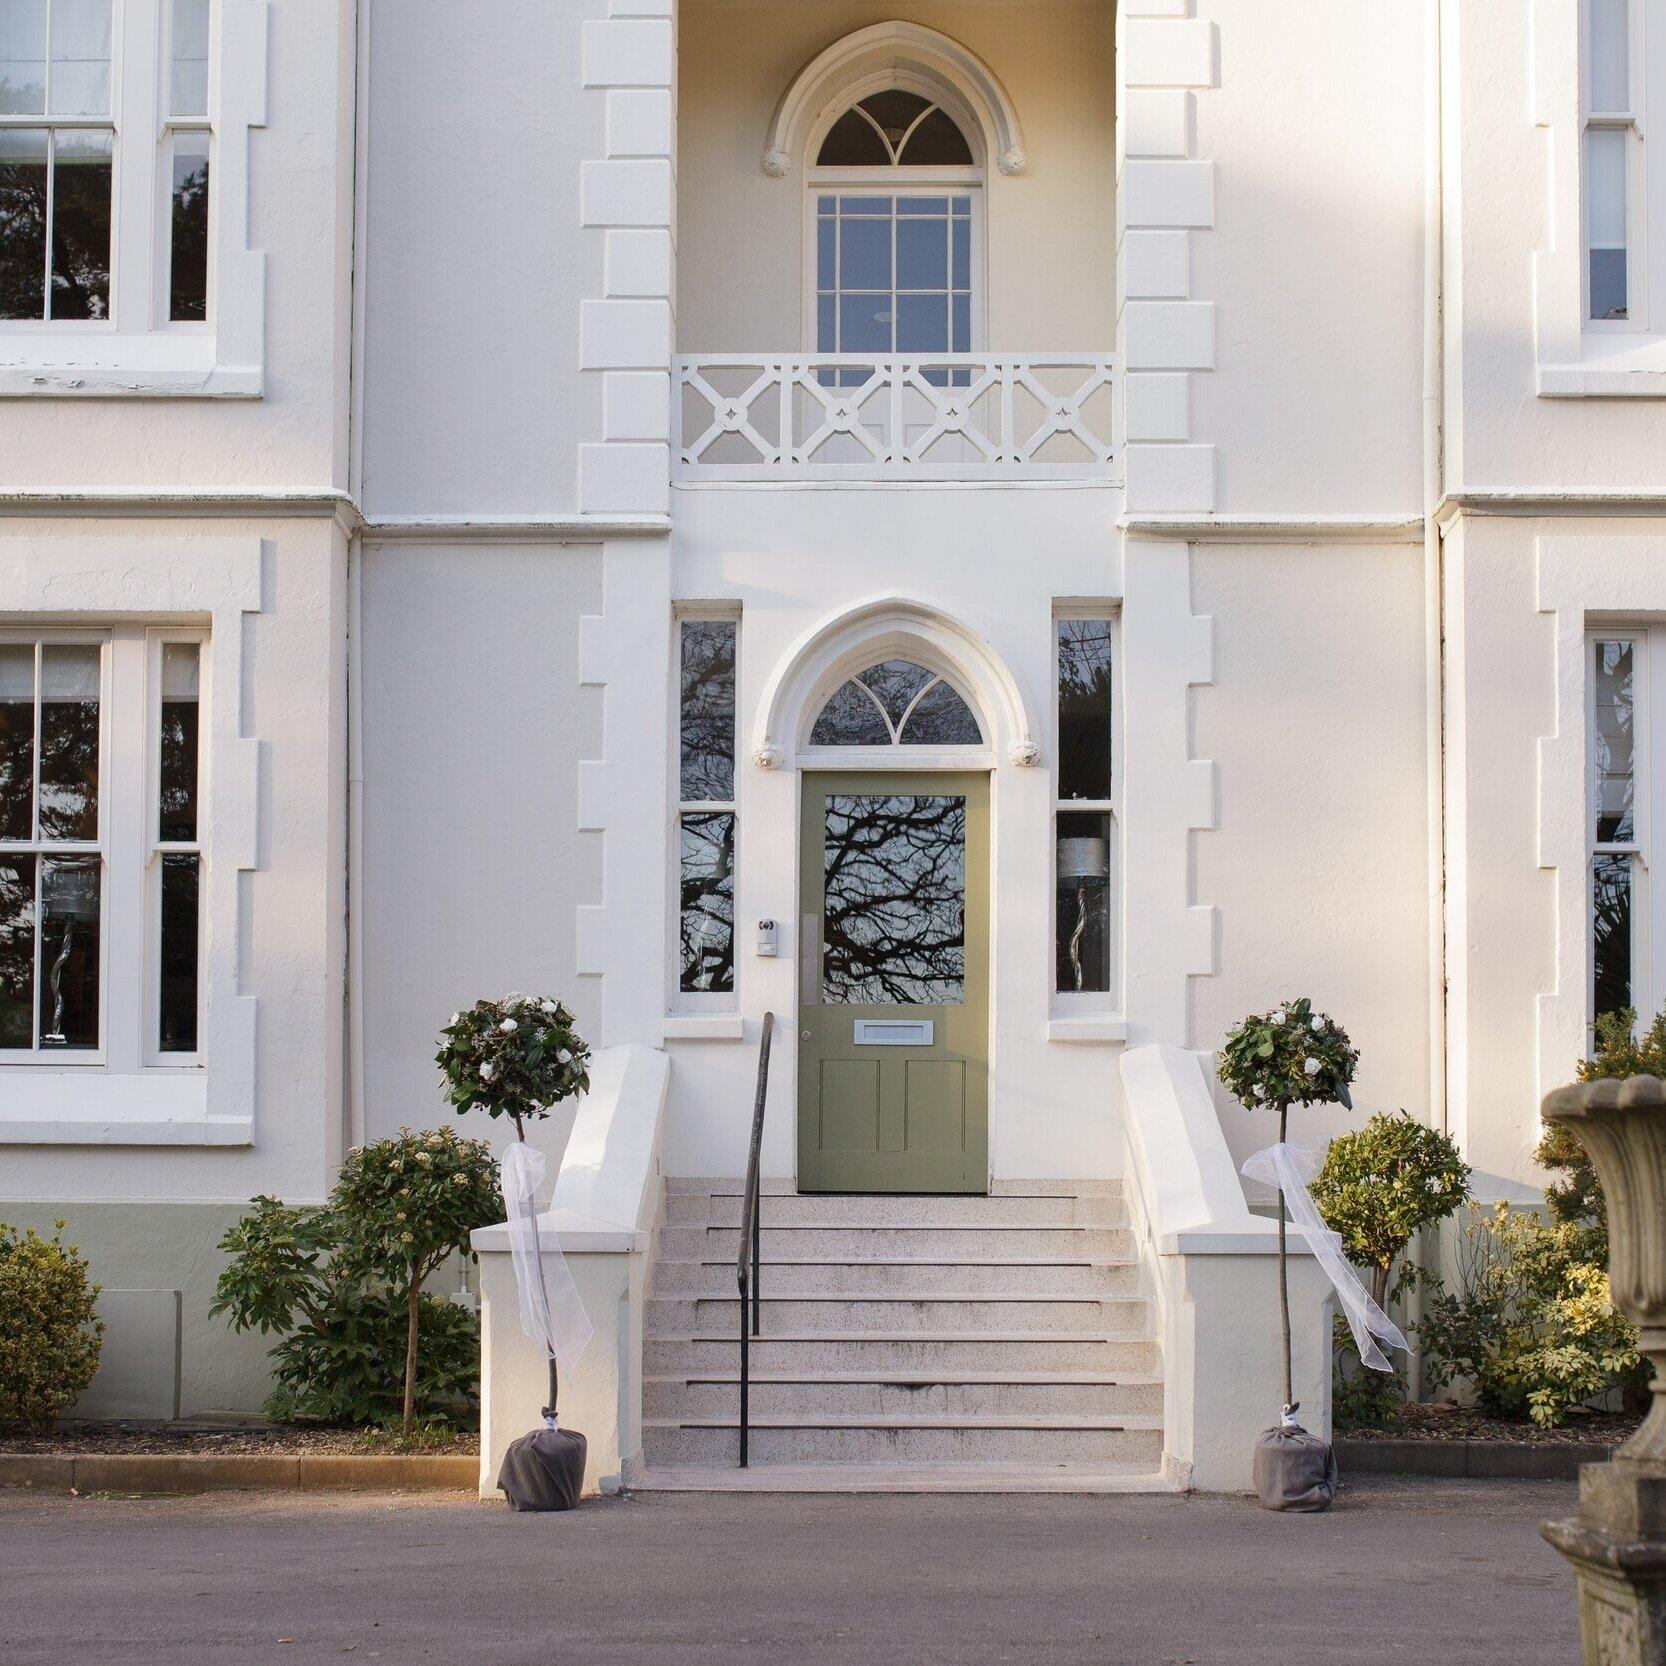 Green+House+Hotel+Entrance.jpg